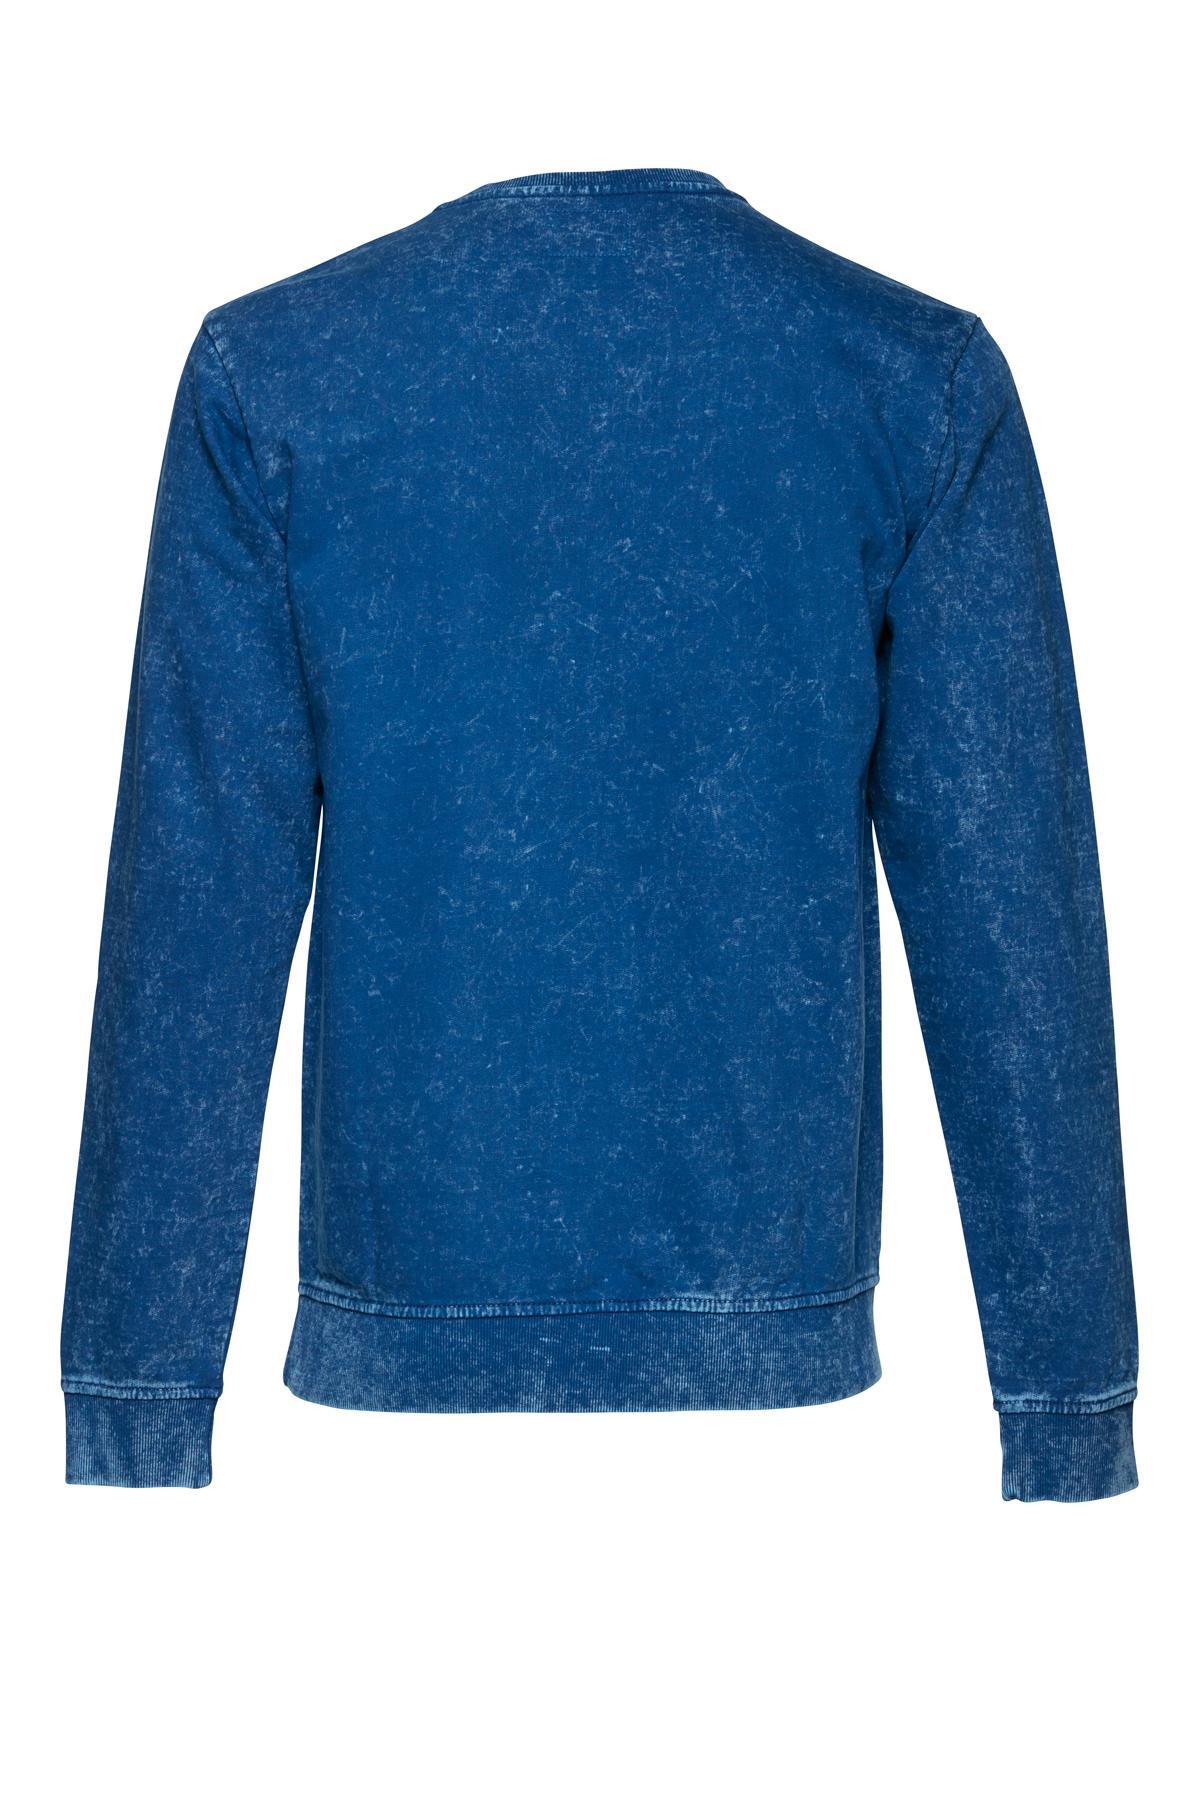 Marineblå Sweatshirt – Køb Marineblå Sweatshirt fra str. M-XXL her